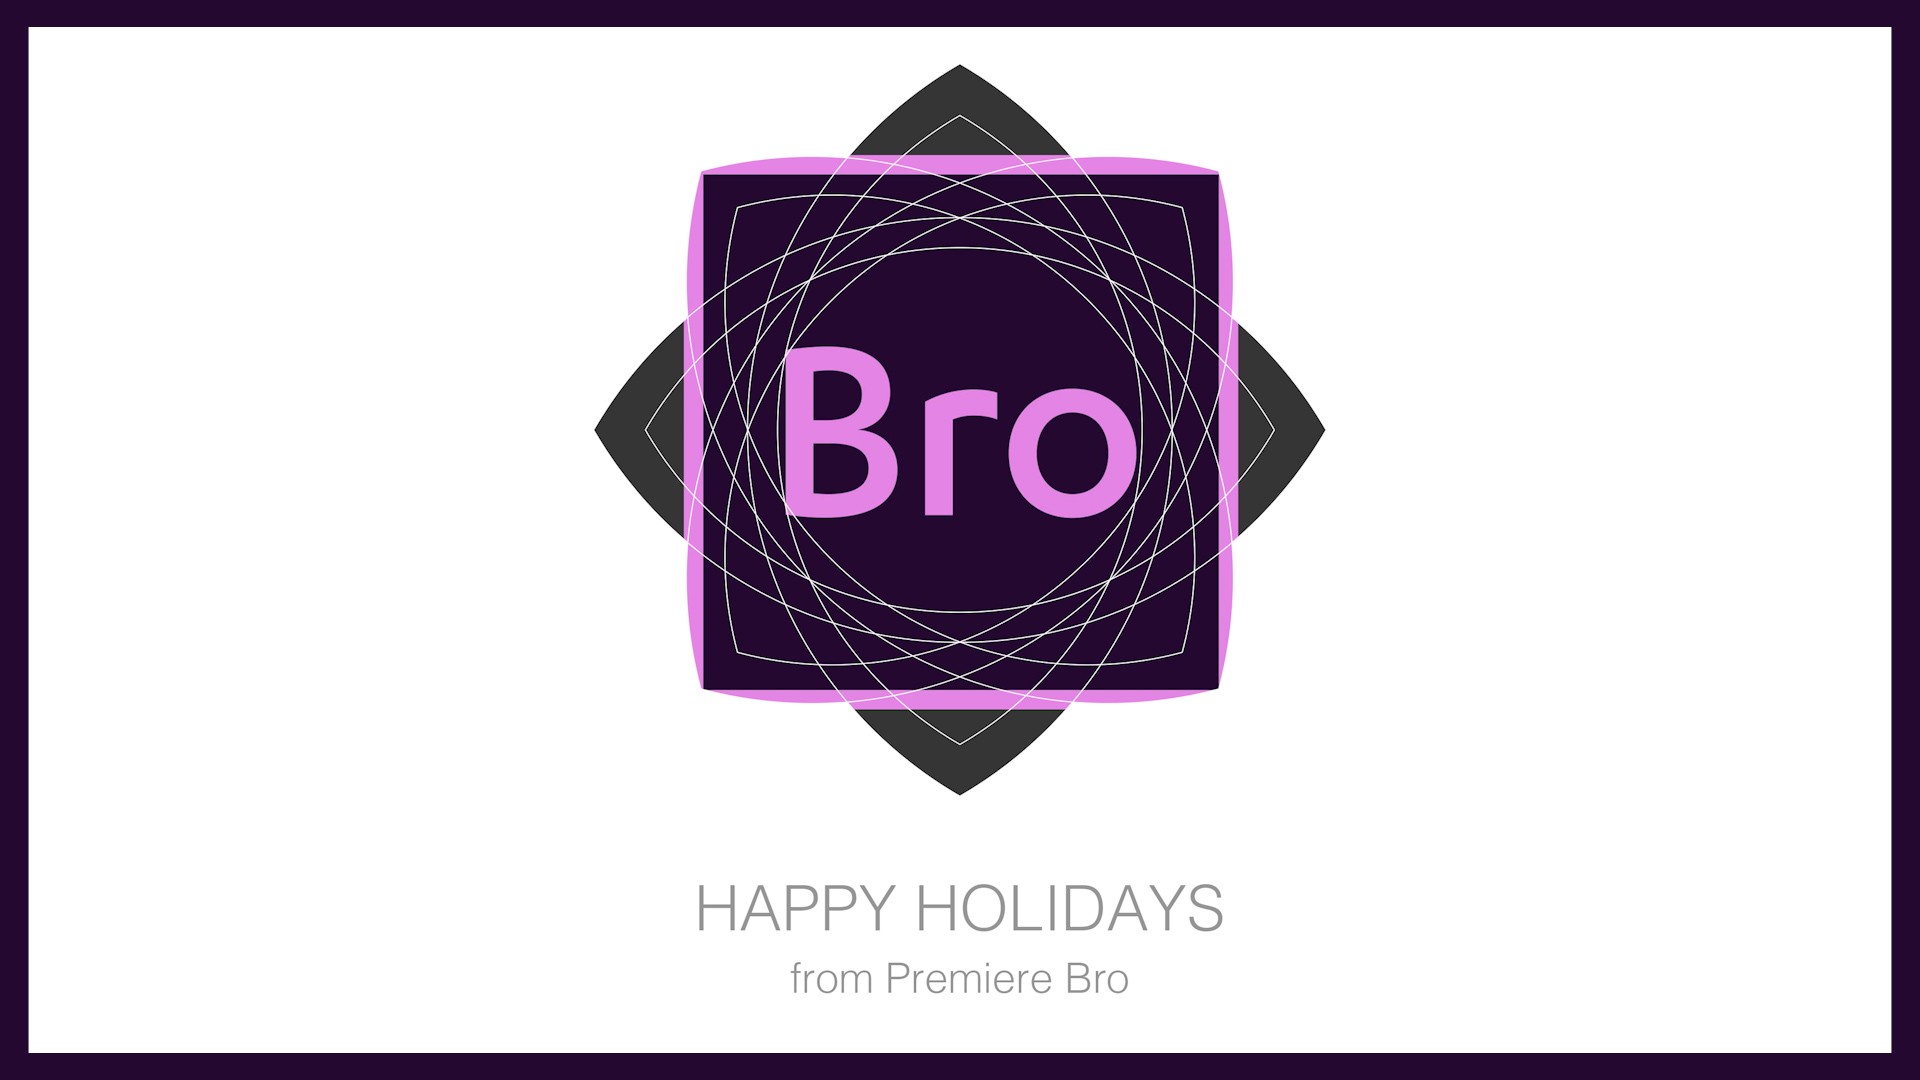 premiere-bro-holiday-2016.jpg